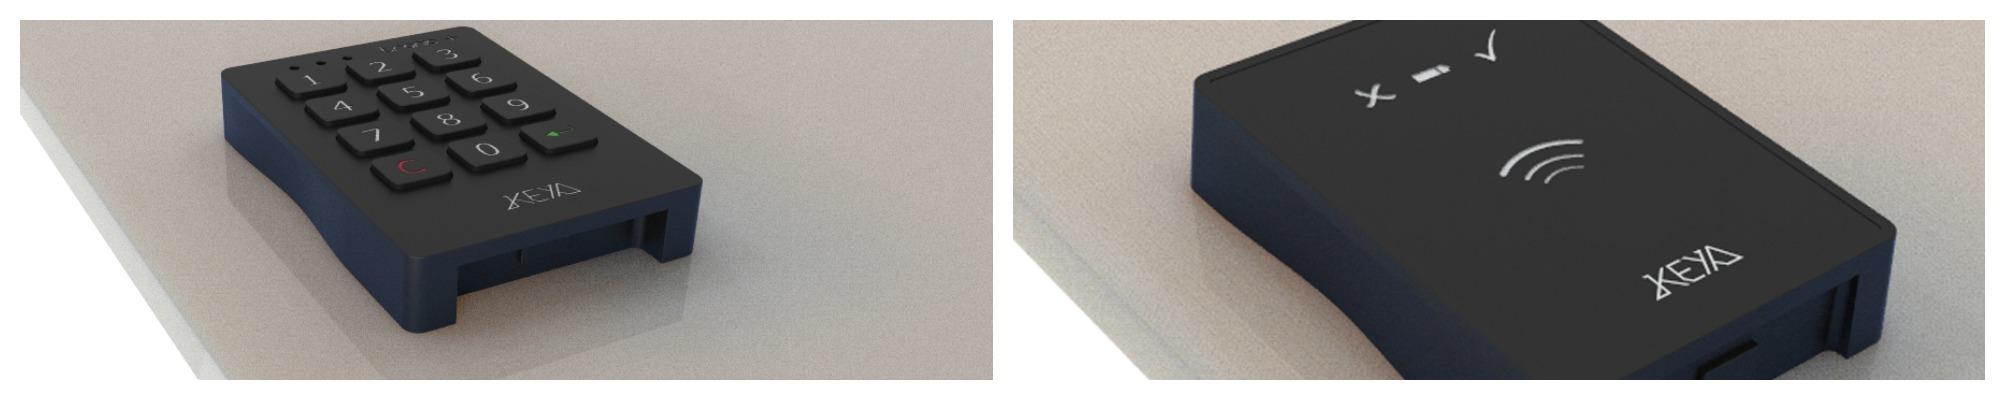 garderobenschr nke spind kaufen metallspind holzspind. Black Bedroom Furniture Sets. Home Design Ideas